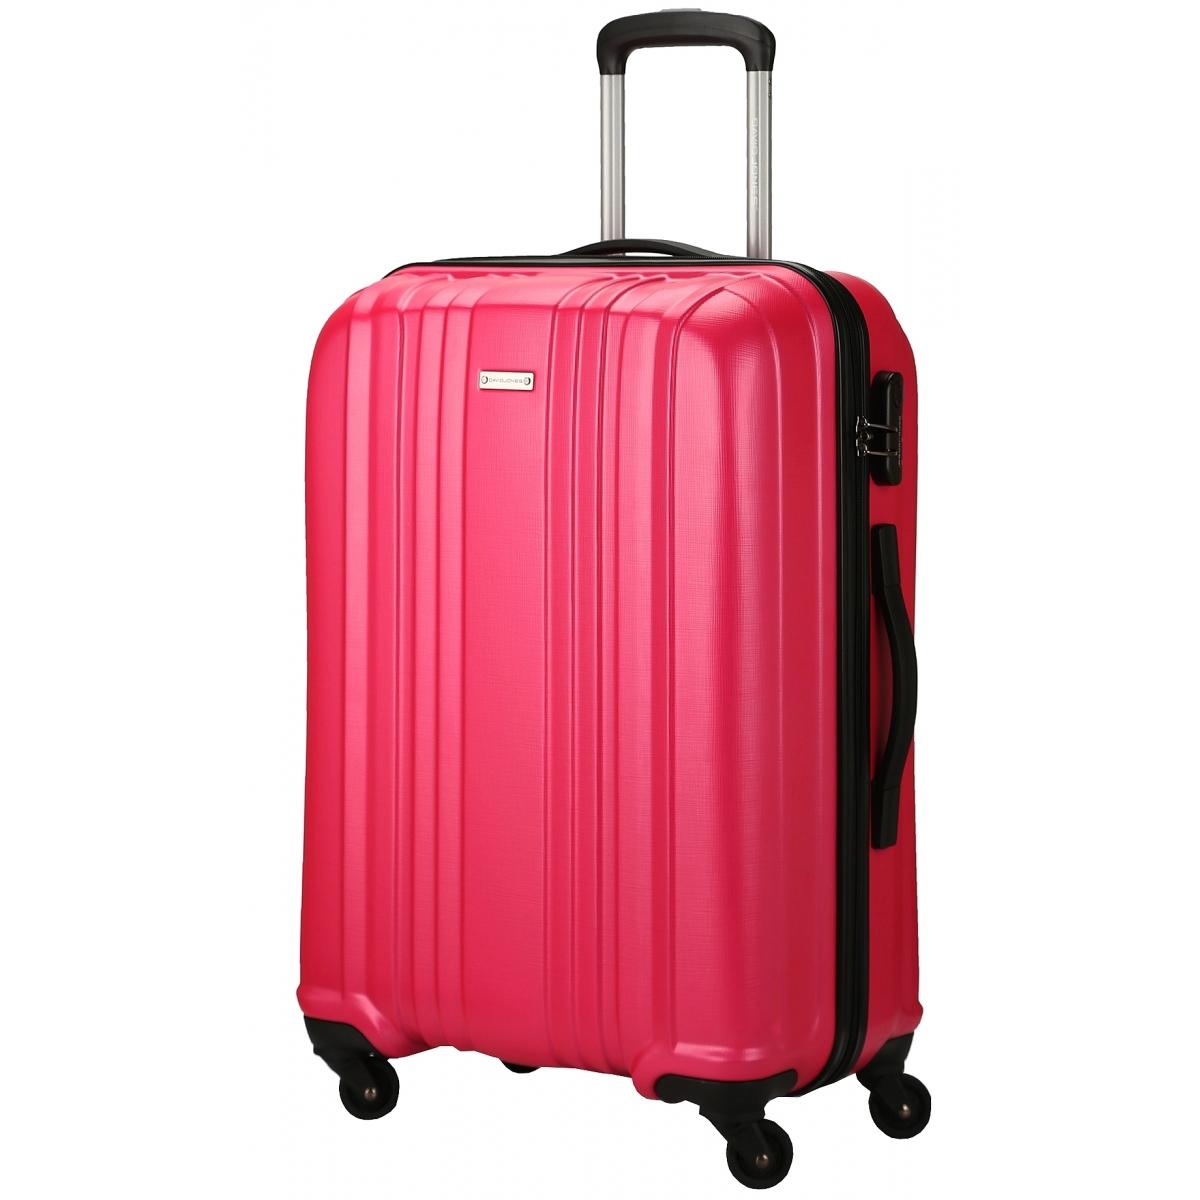 valise rigide david jones taille m 66cm ba10171m couleur principale fushia promotion. Black Bedroom Furniture Sets. Home Design Ideas